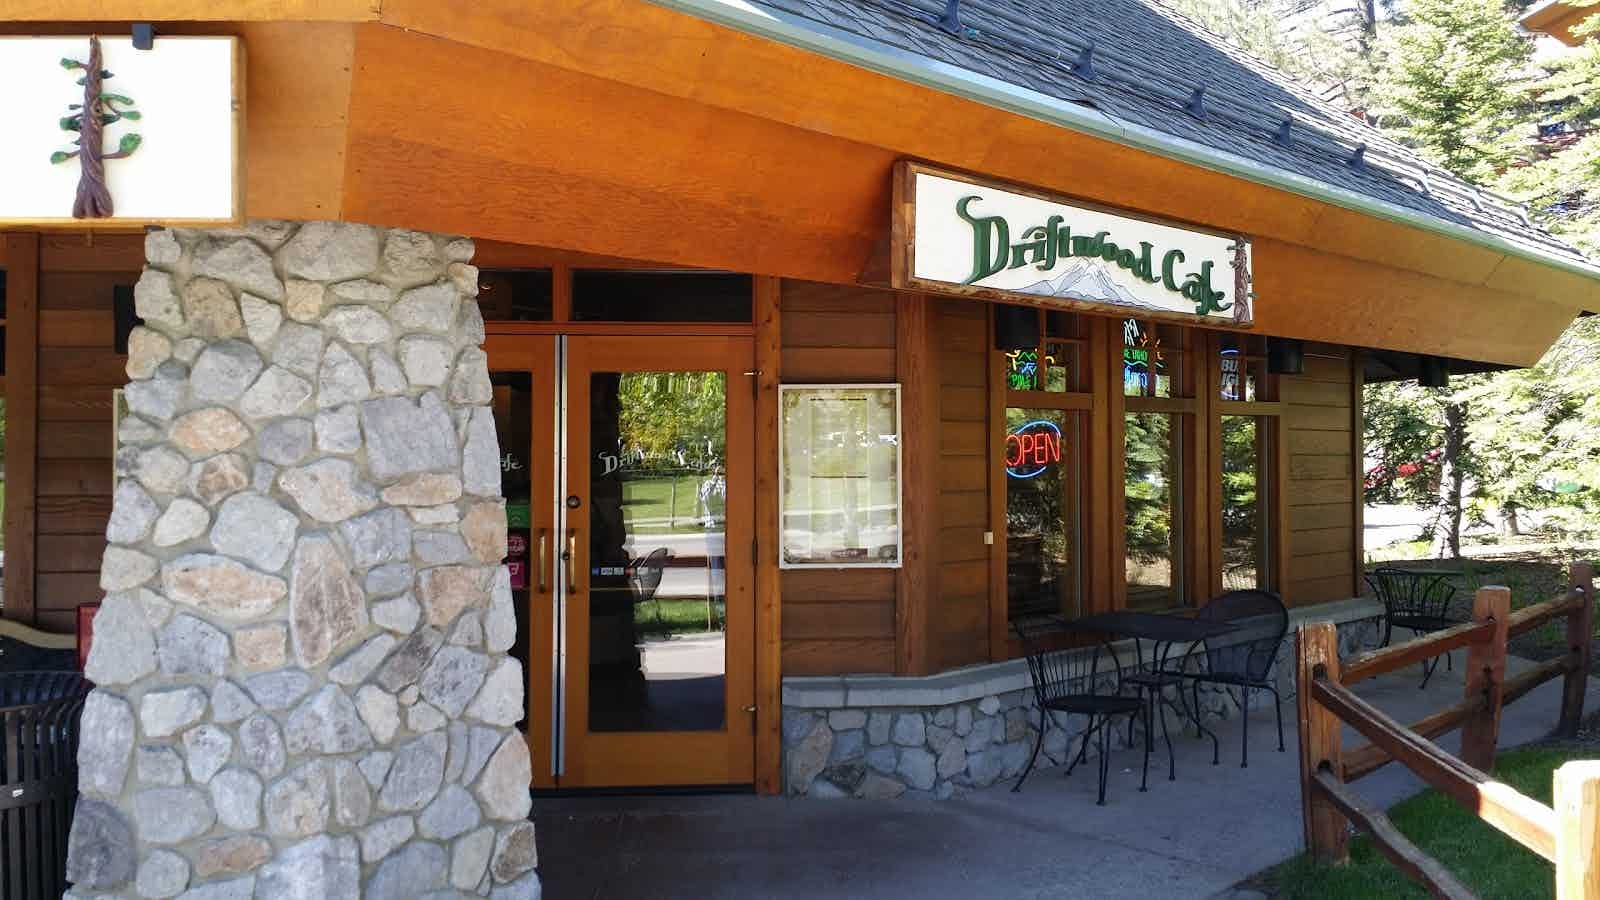 driftwood cafe south lake tahoe